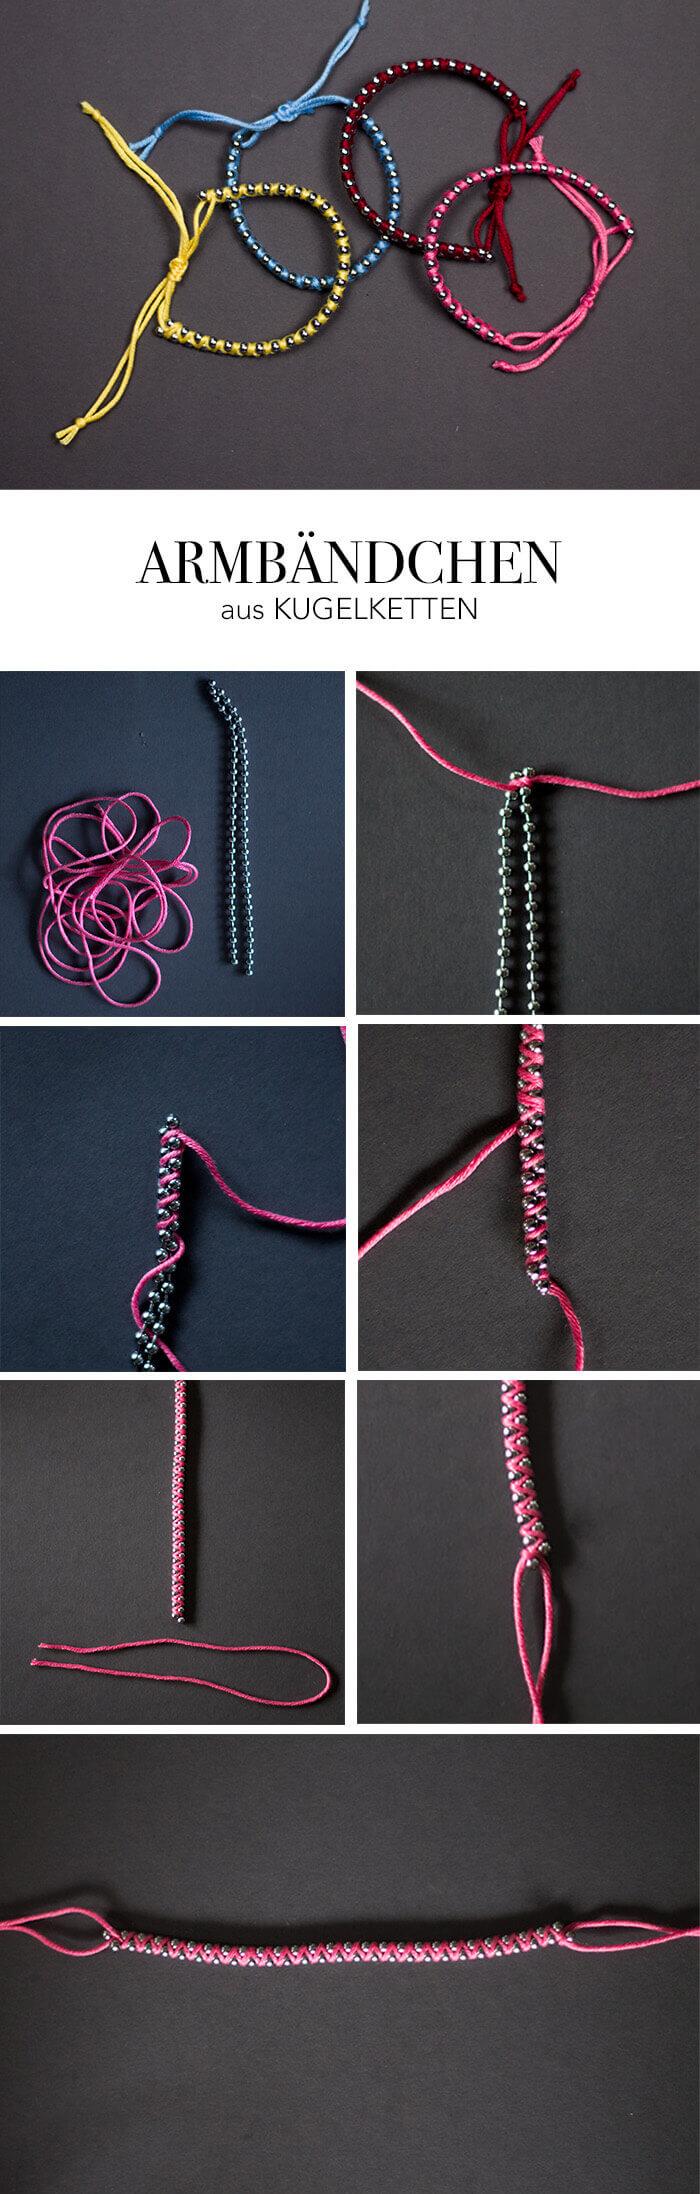 DIY Anleitung Armband aus Kugelkette - Do it yourself Blog lindaloves.de